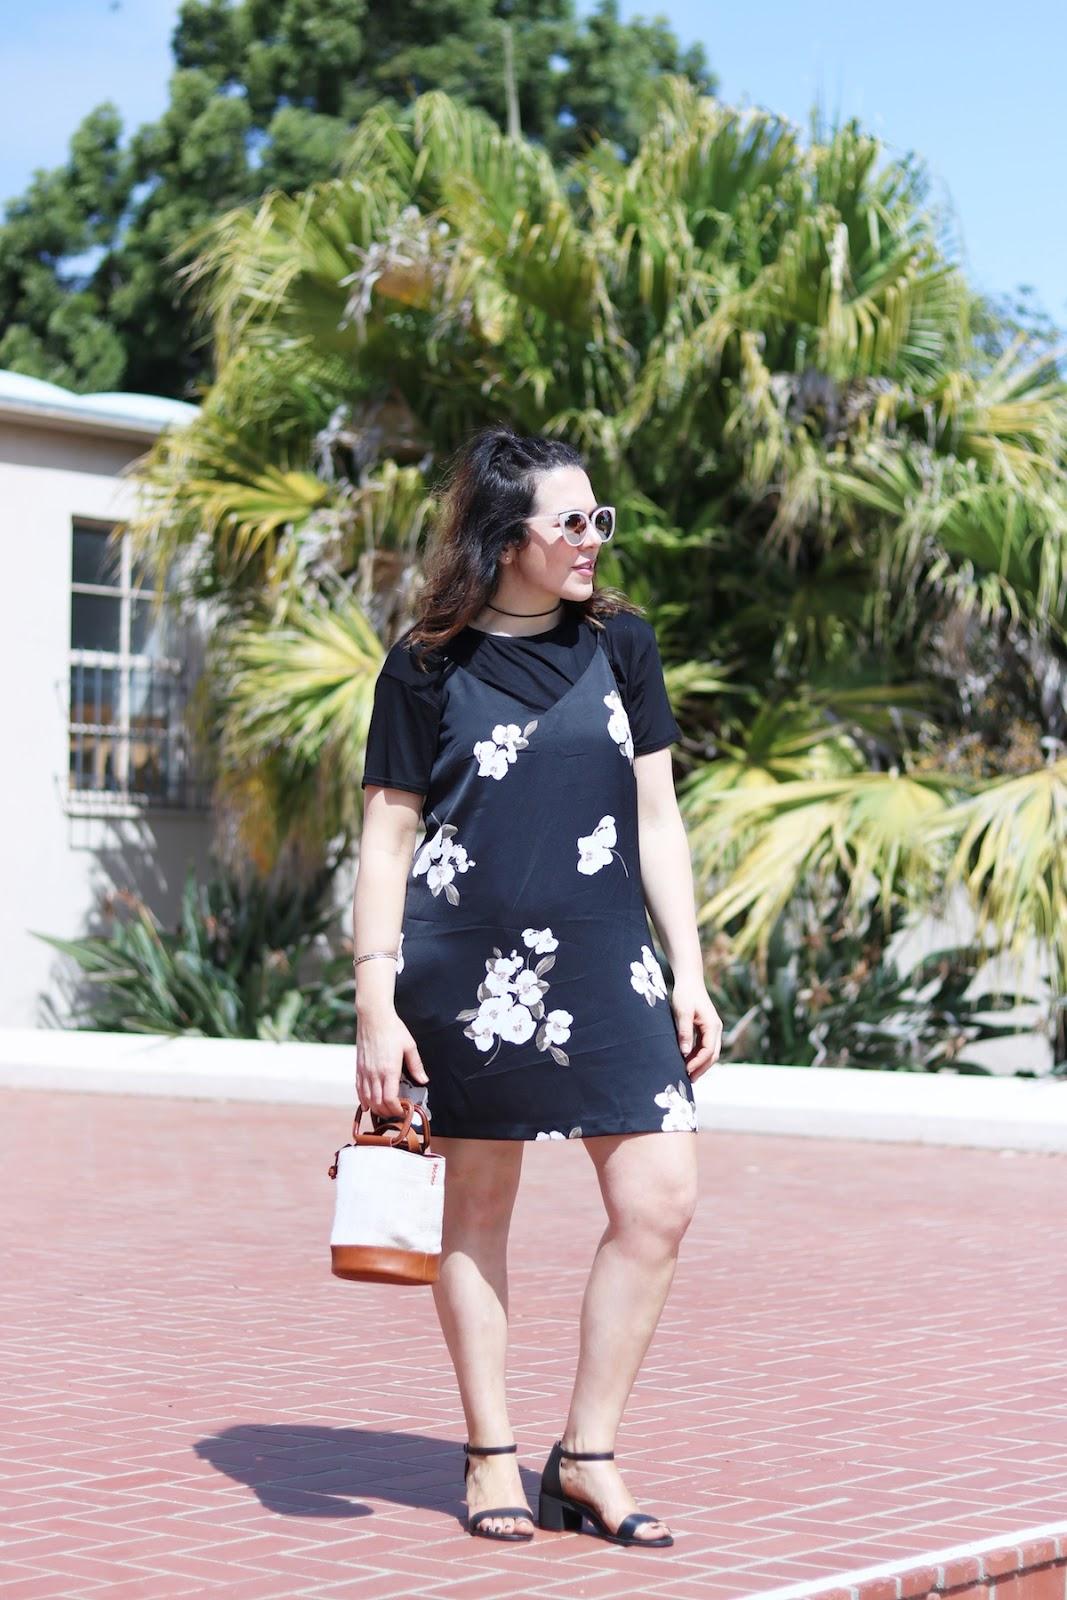 Dynamite floral slip dress outfit vancouver fashion blogger san diego le chateau sandals sunglasses ela bucket bag